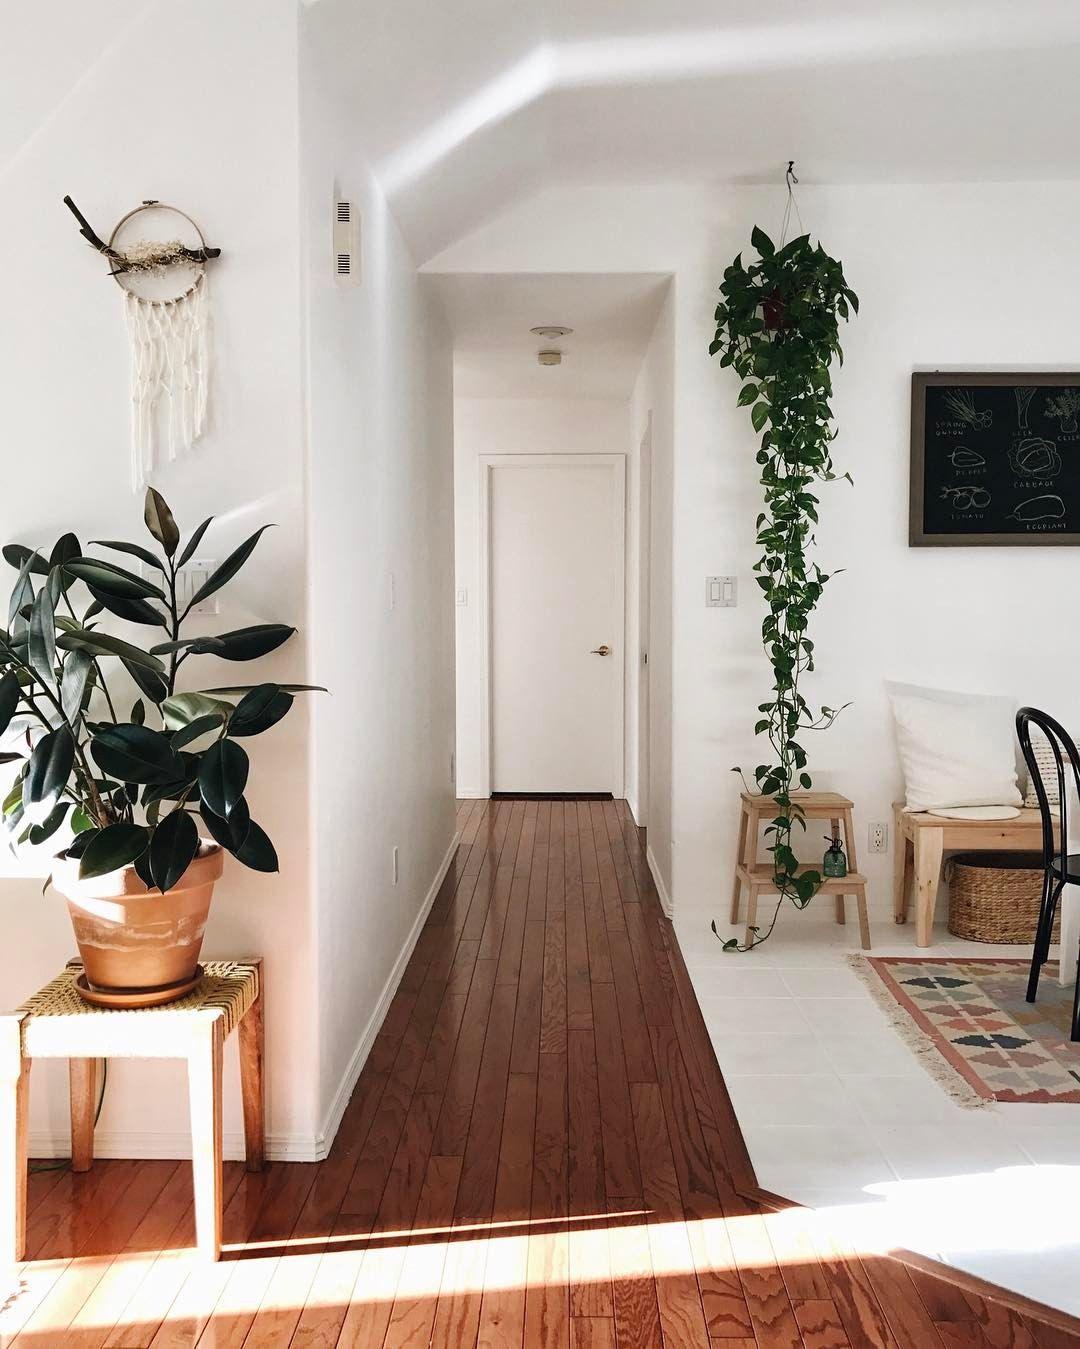 Living Room Bedroom Pinterest: Home Decor, Minimalist